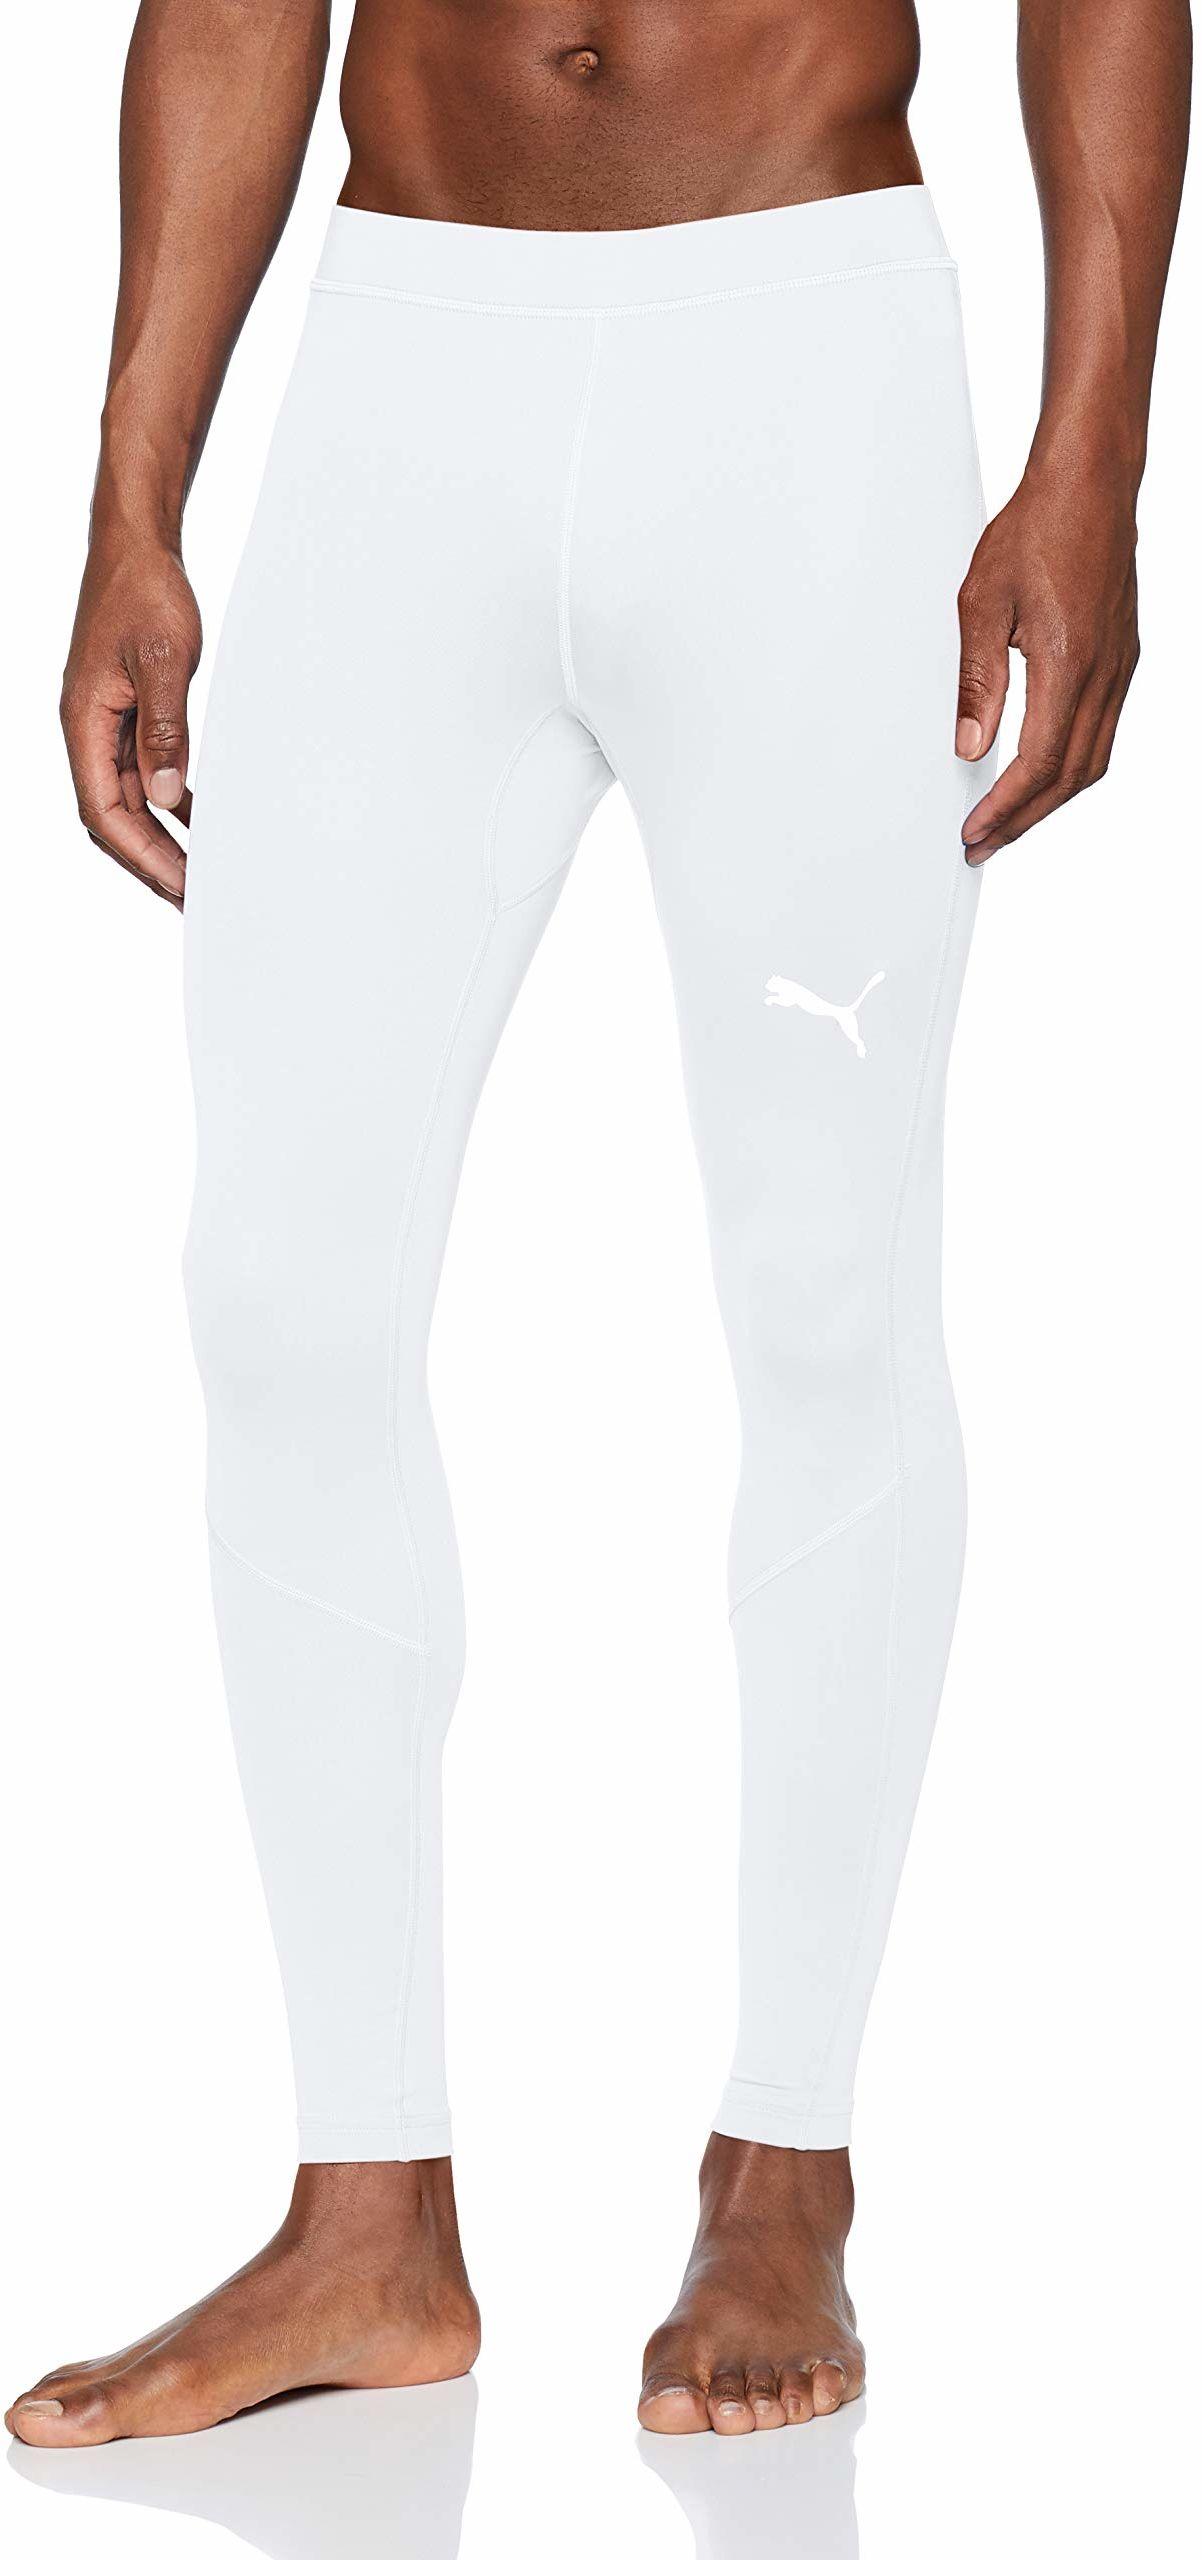 PUMA Liga Baselayer Long Tight spodnie dla dorosłych